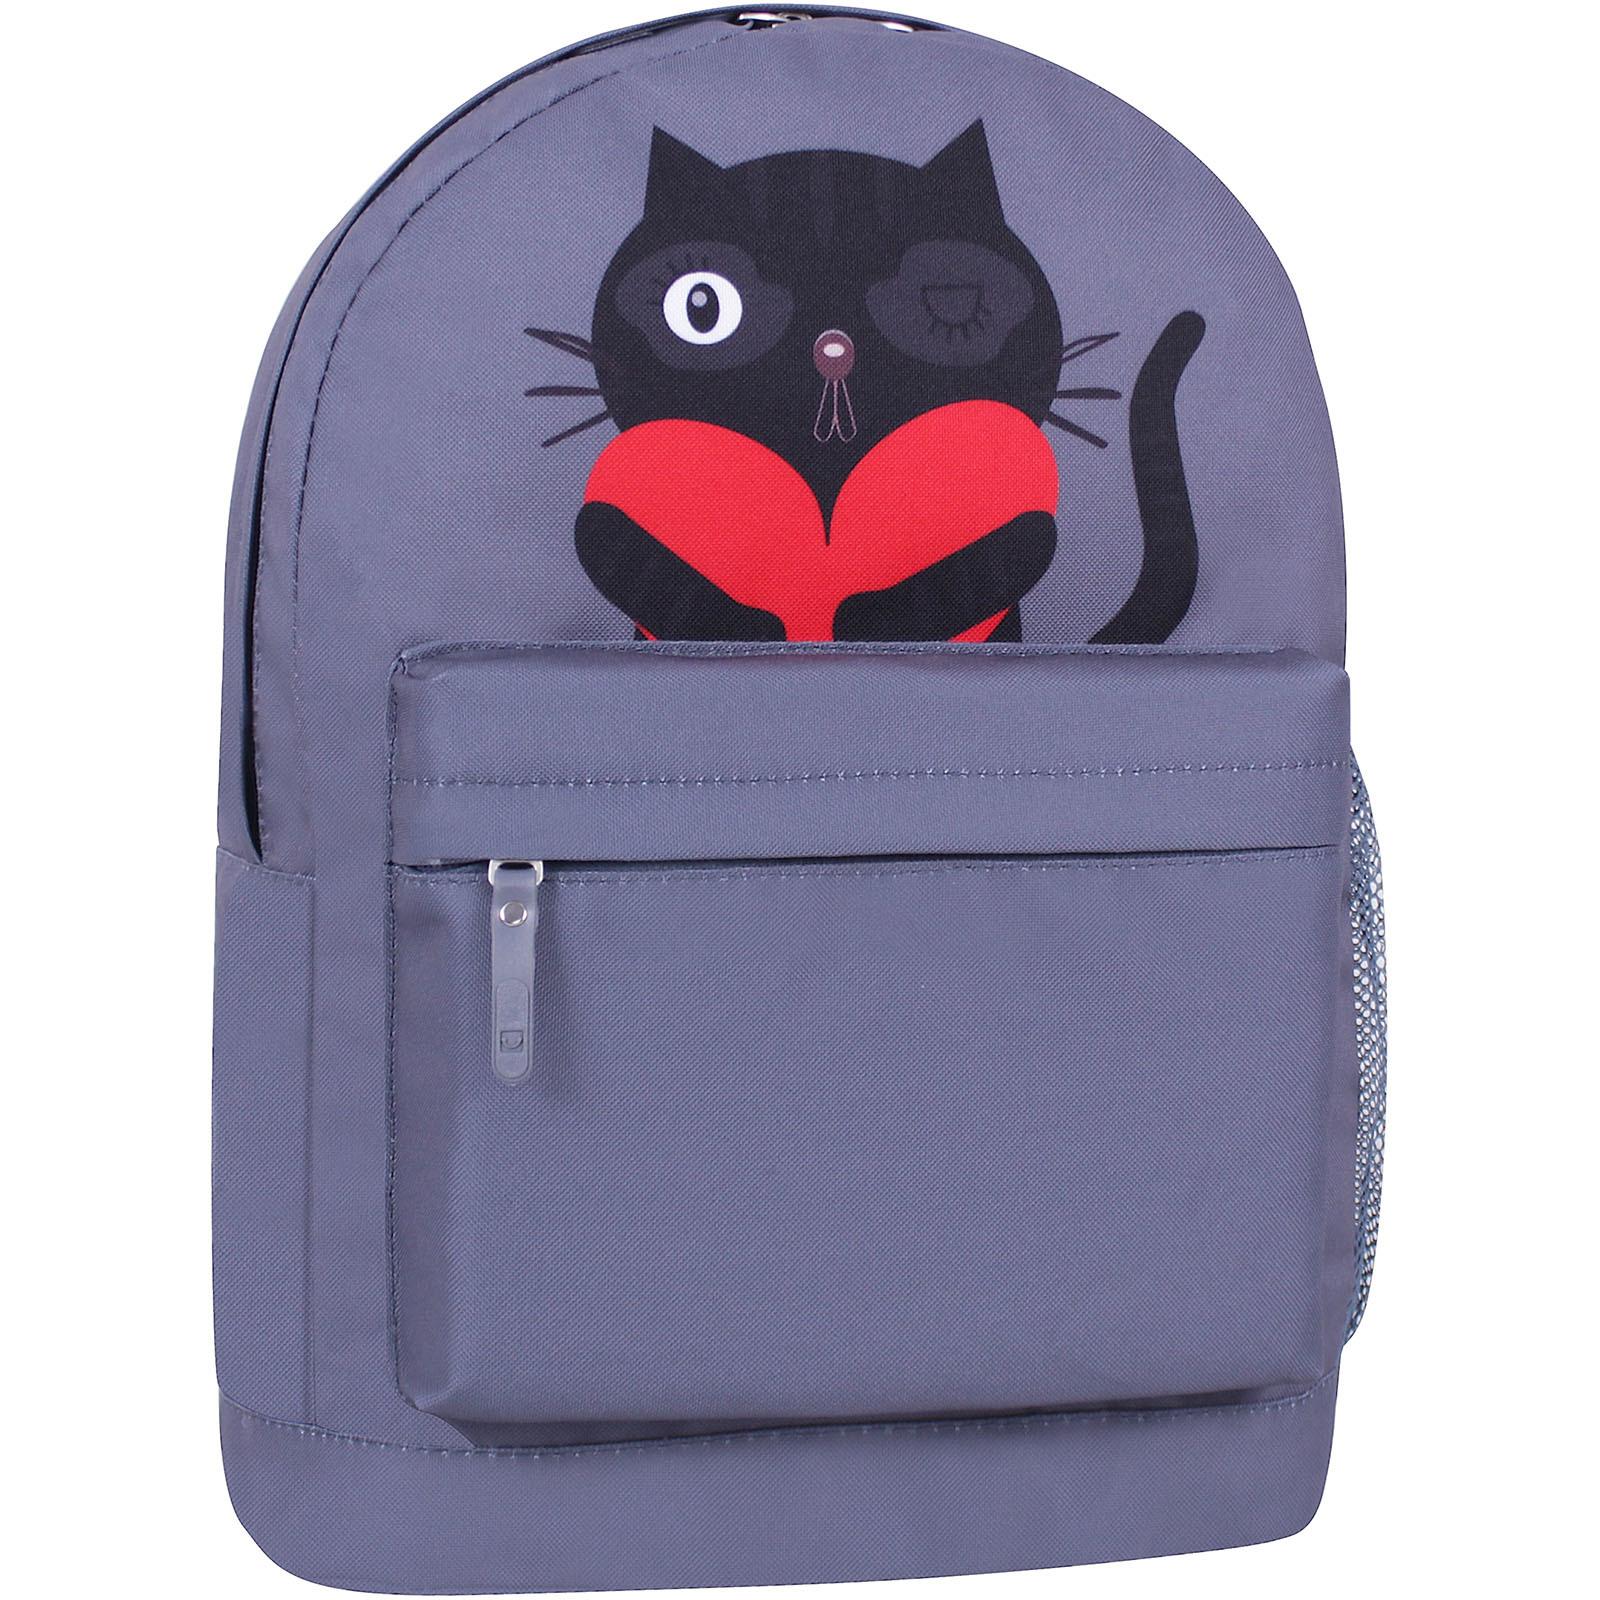 Городские рюкзаки Рюкзак Bagland Молодежный 17 л. сублімація 734 (00533664) IMG_7910_суб.734_.JPG